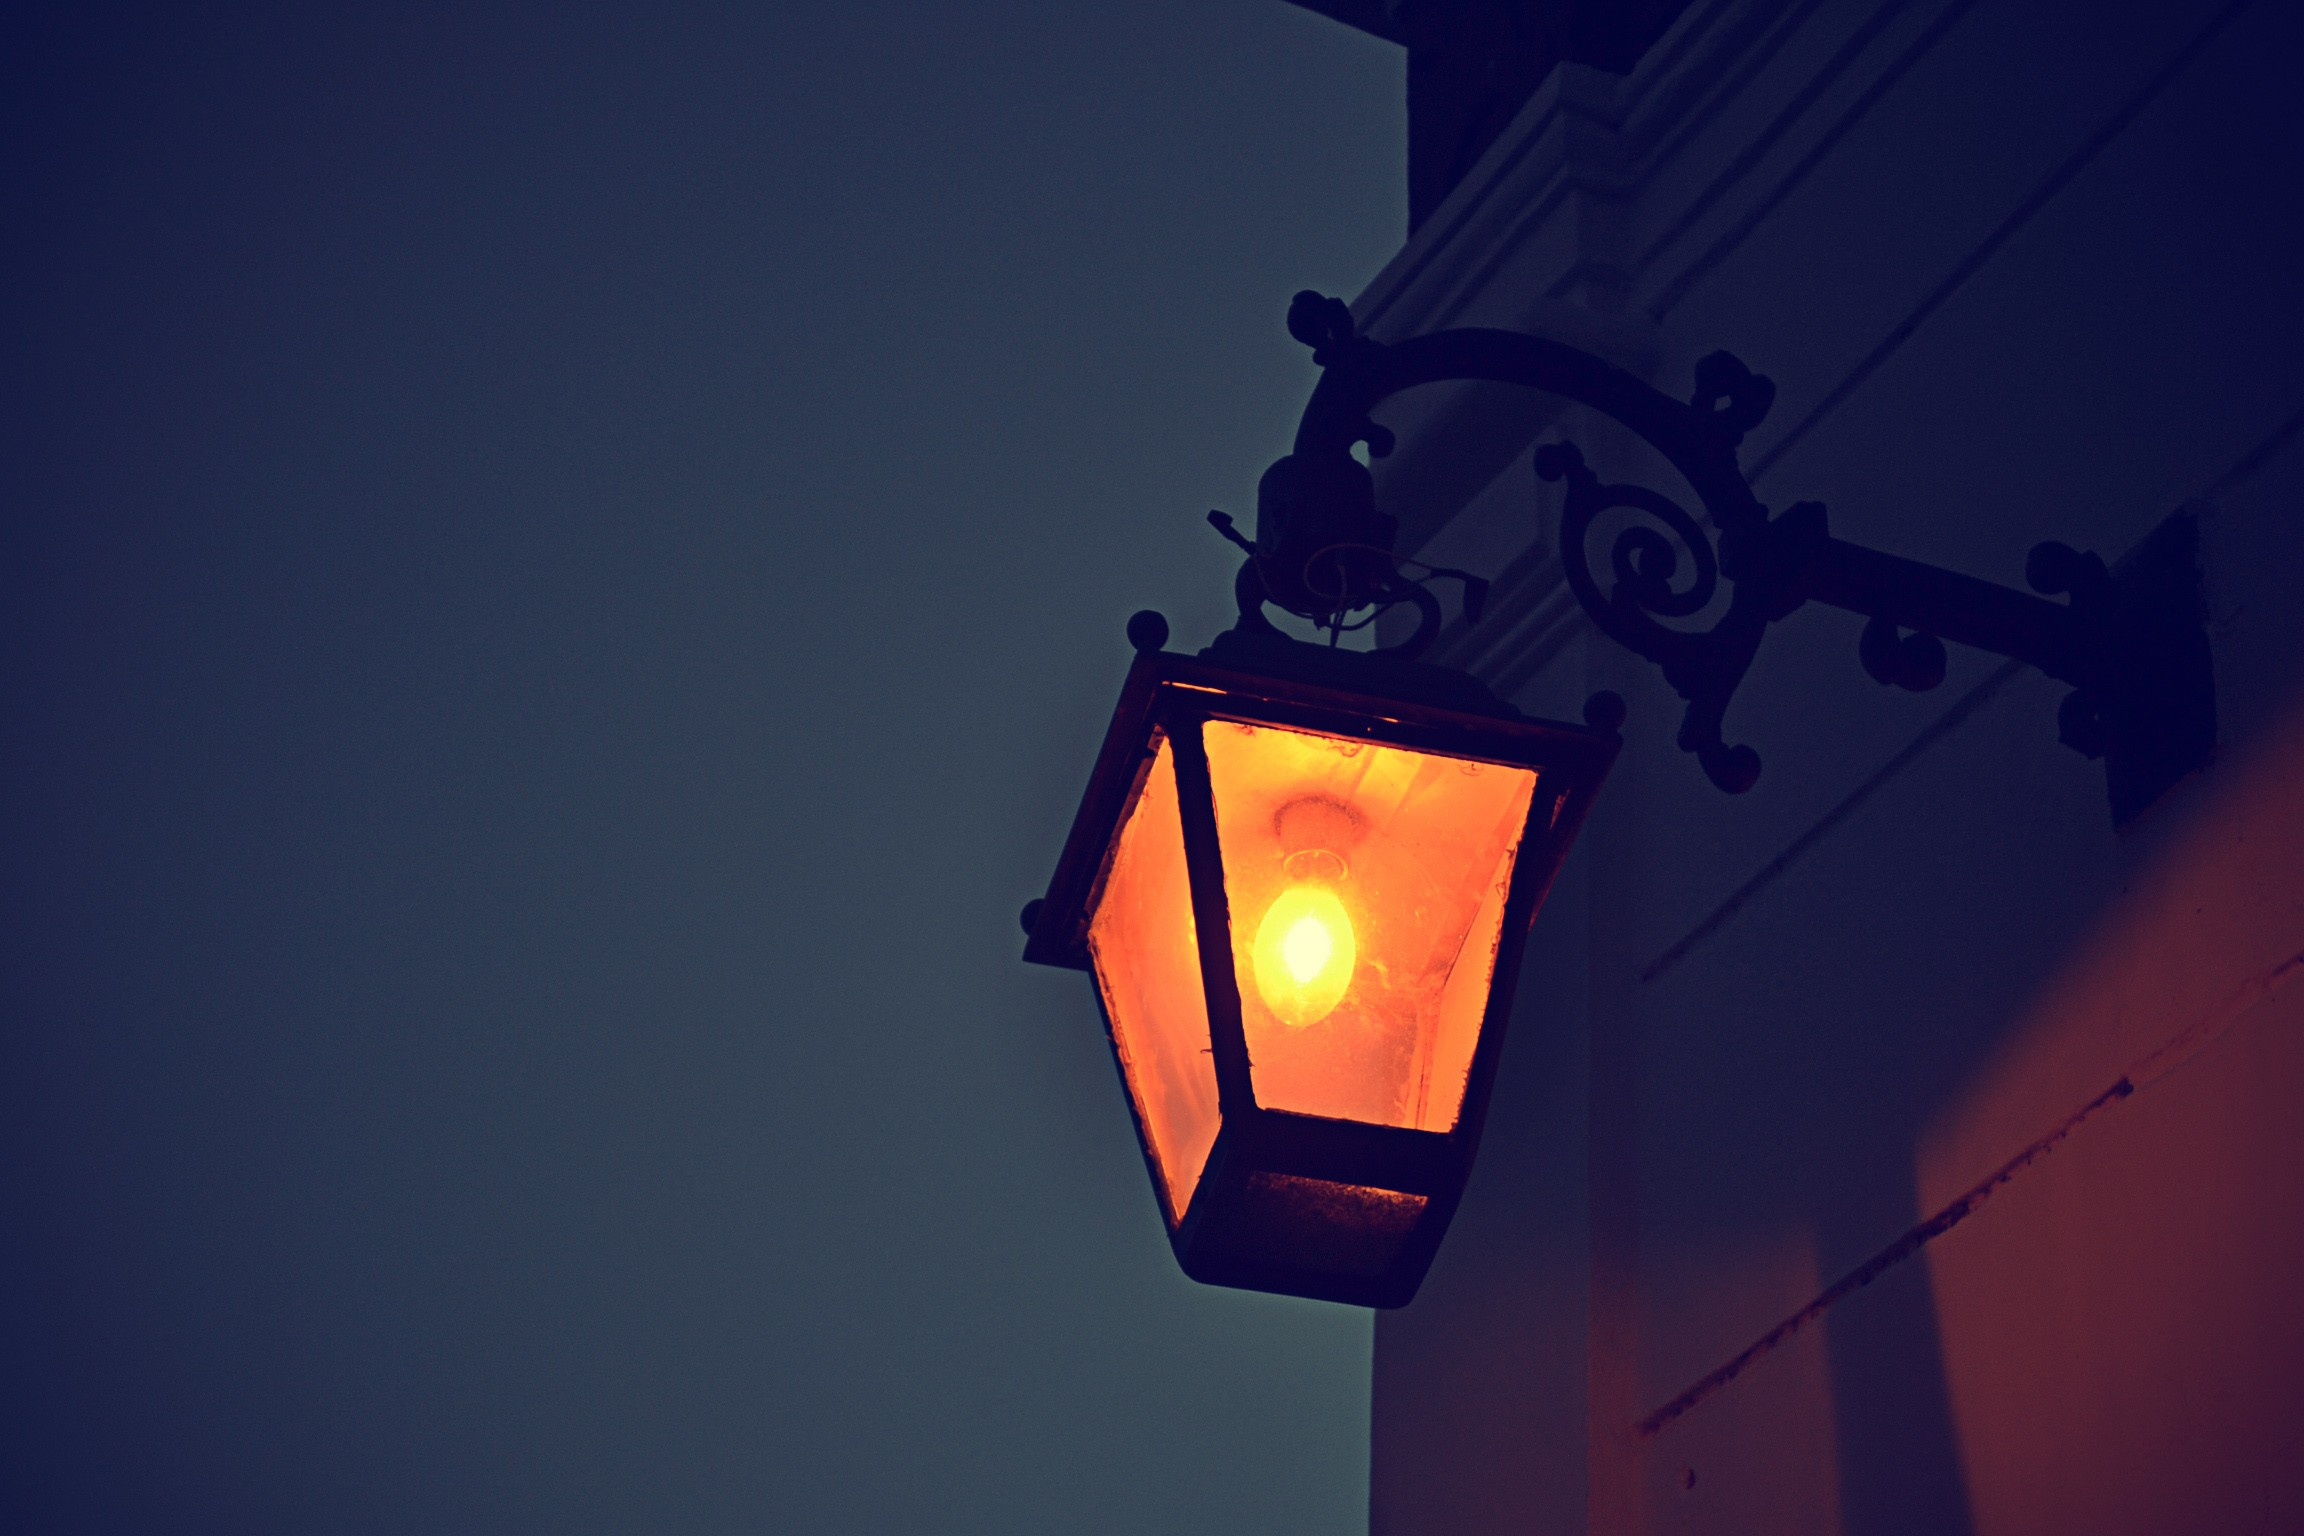 картинки с фонарями вечером рисунки реализации любого проекта